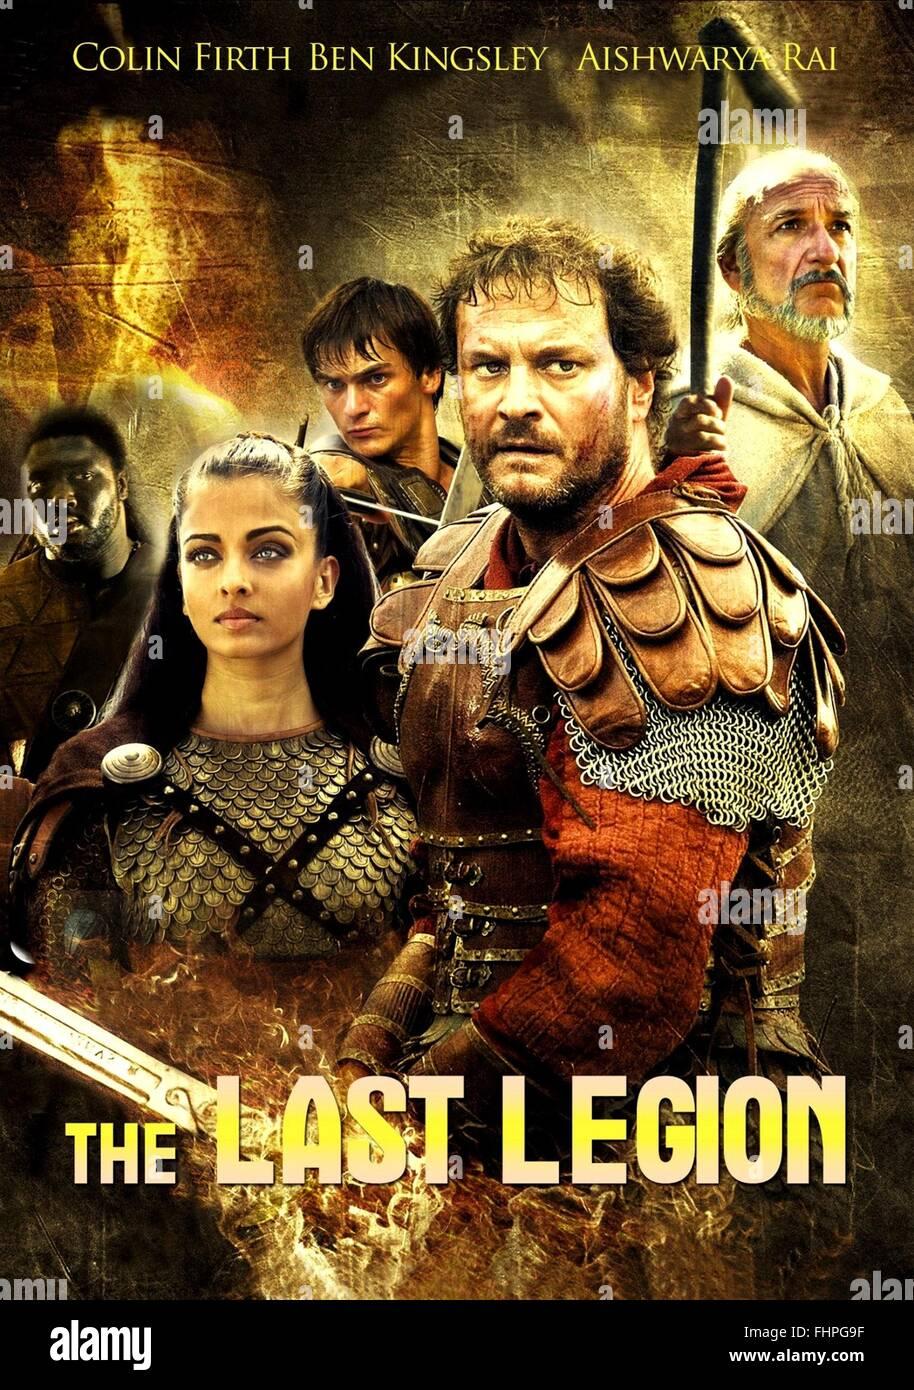 movie poster the last legion 2007 stock photo 96996747